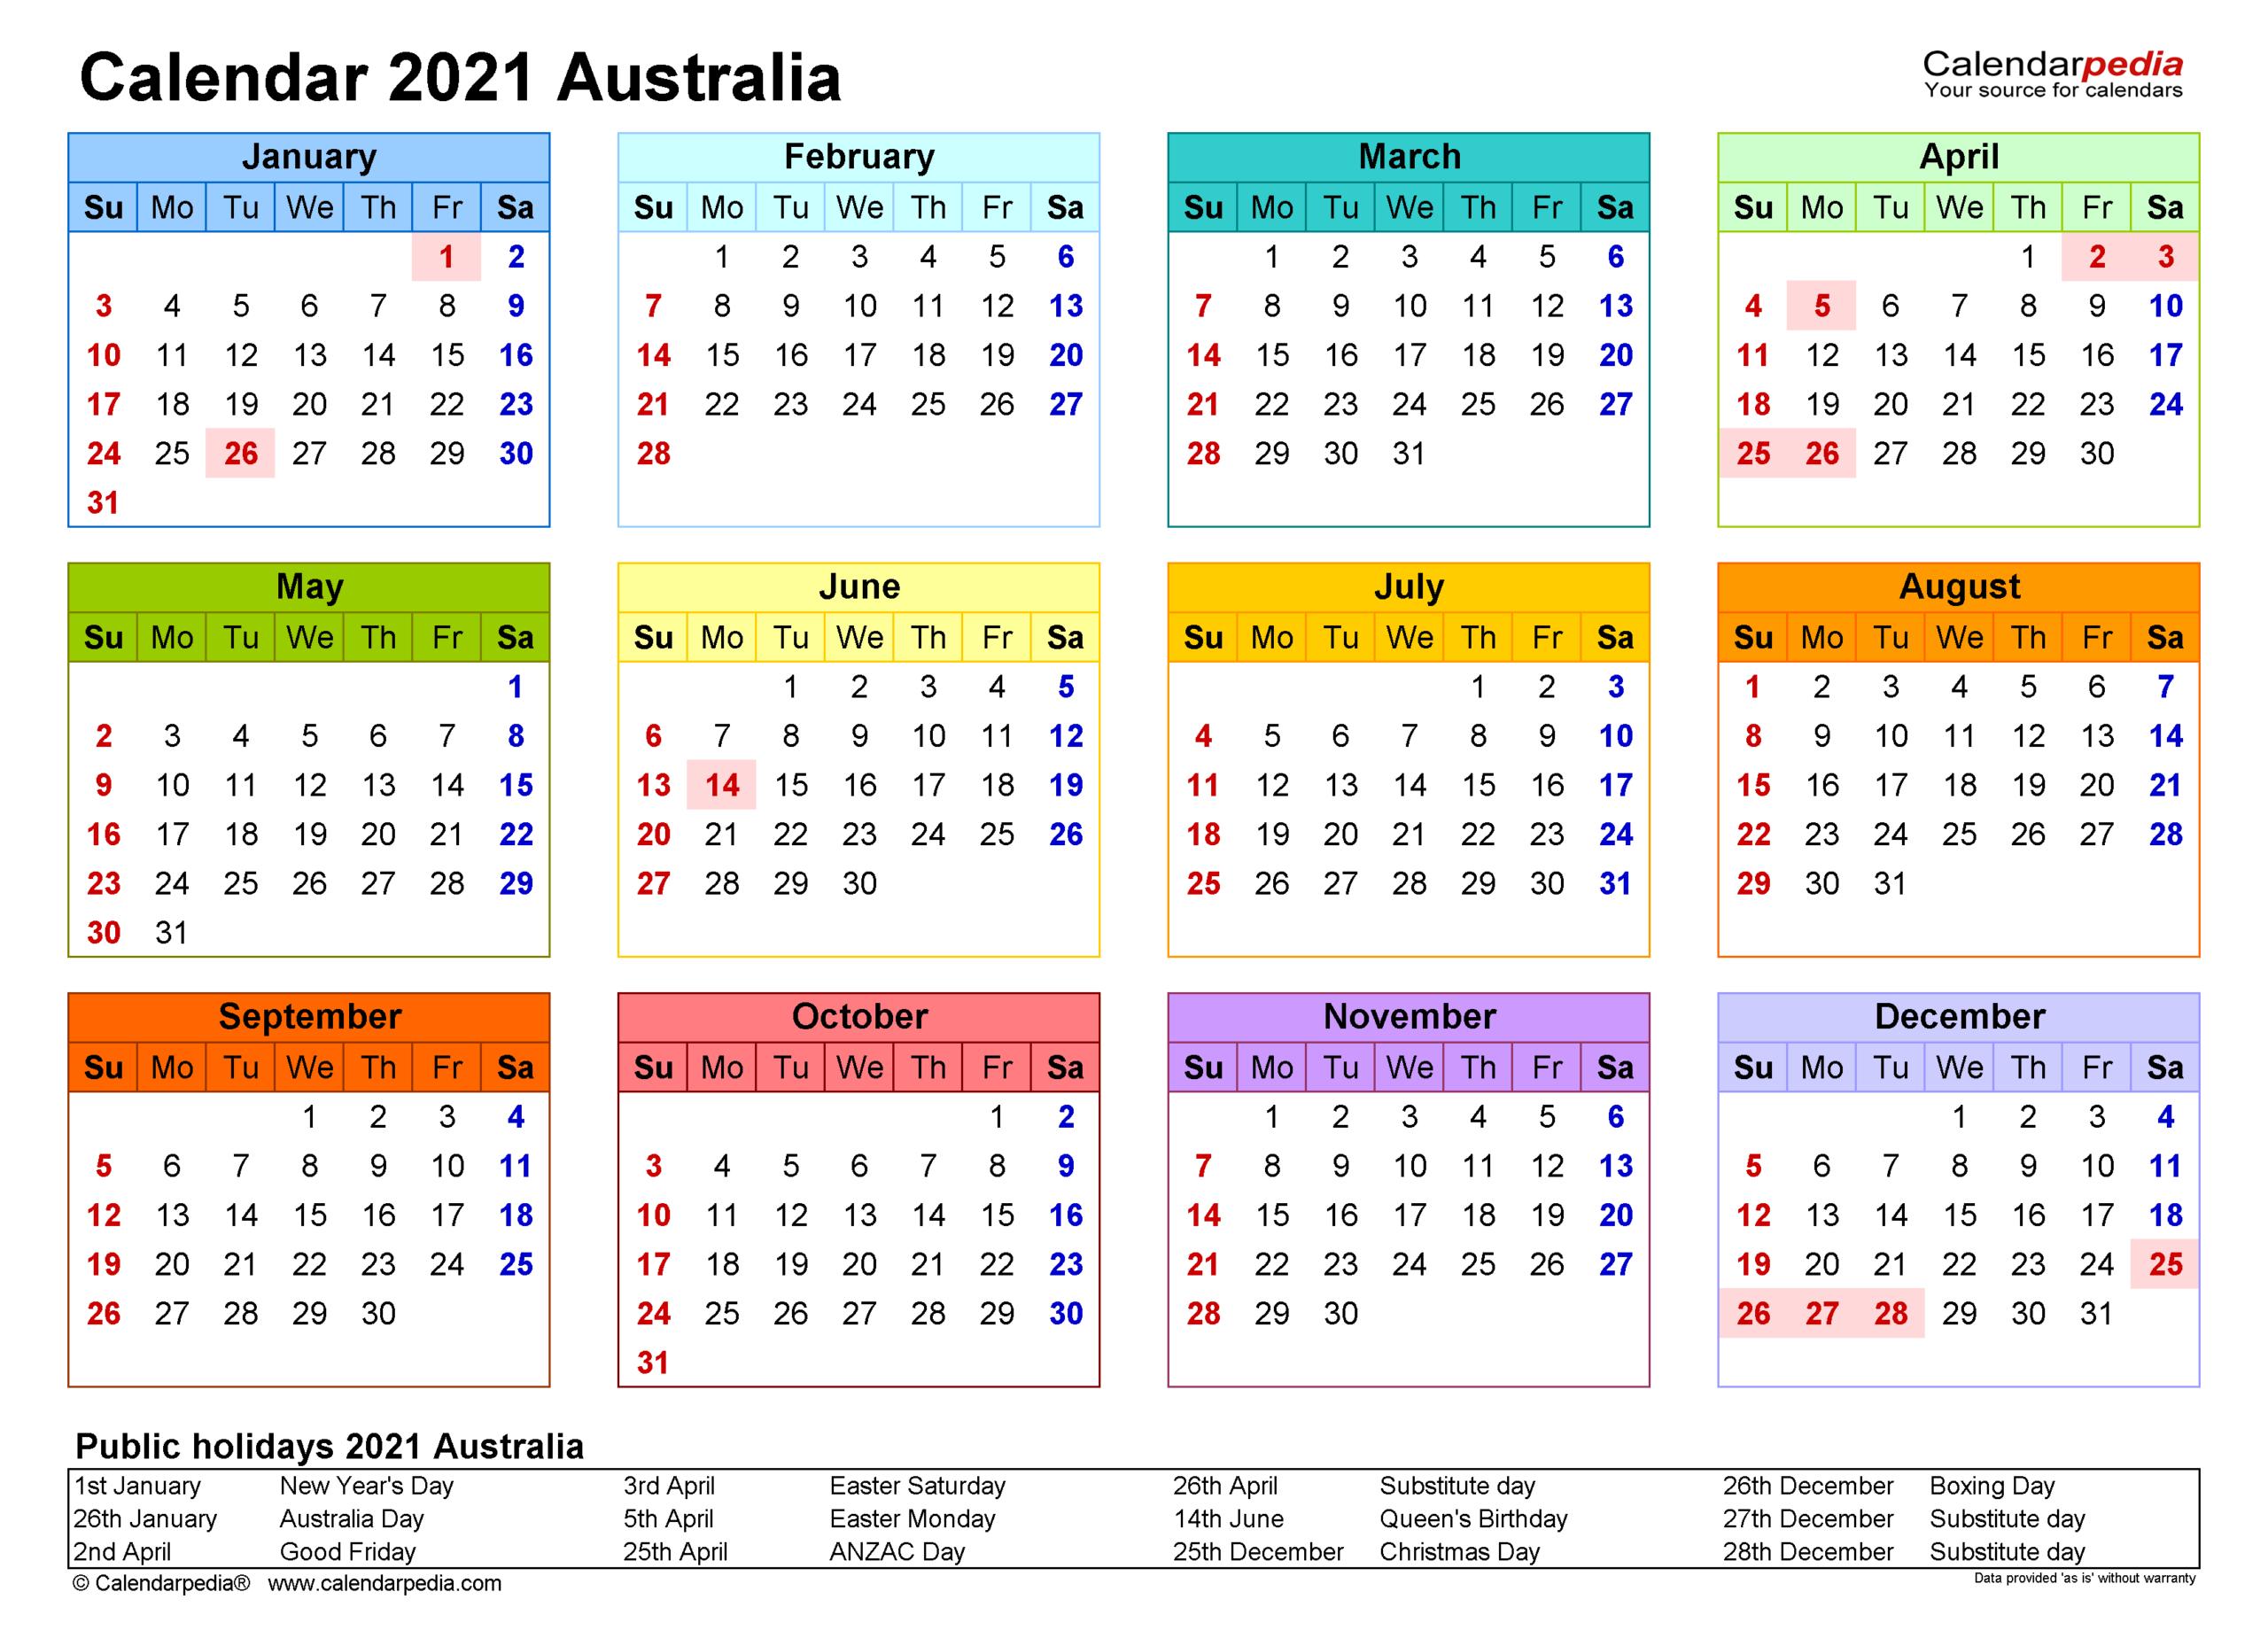 Australia Calendar 2021 - Free Printable Excel Templates for Sunday To Saturday Year Calendar 2021/21